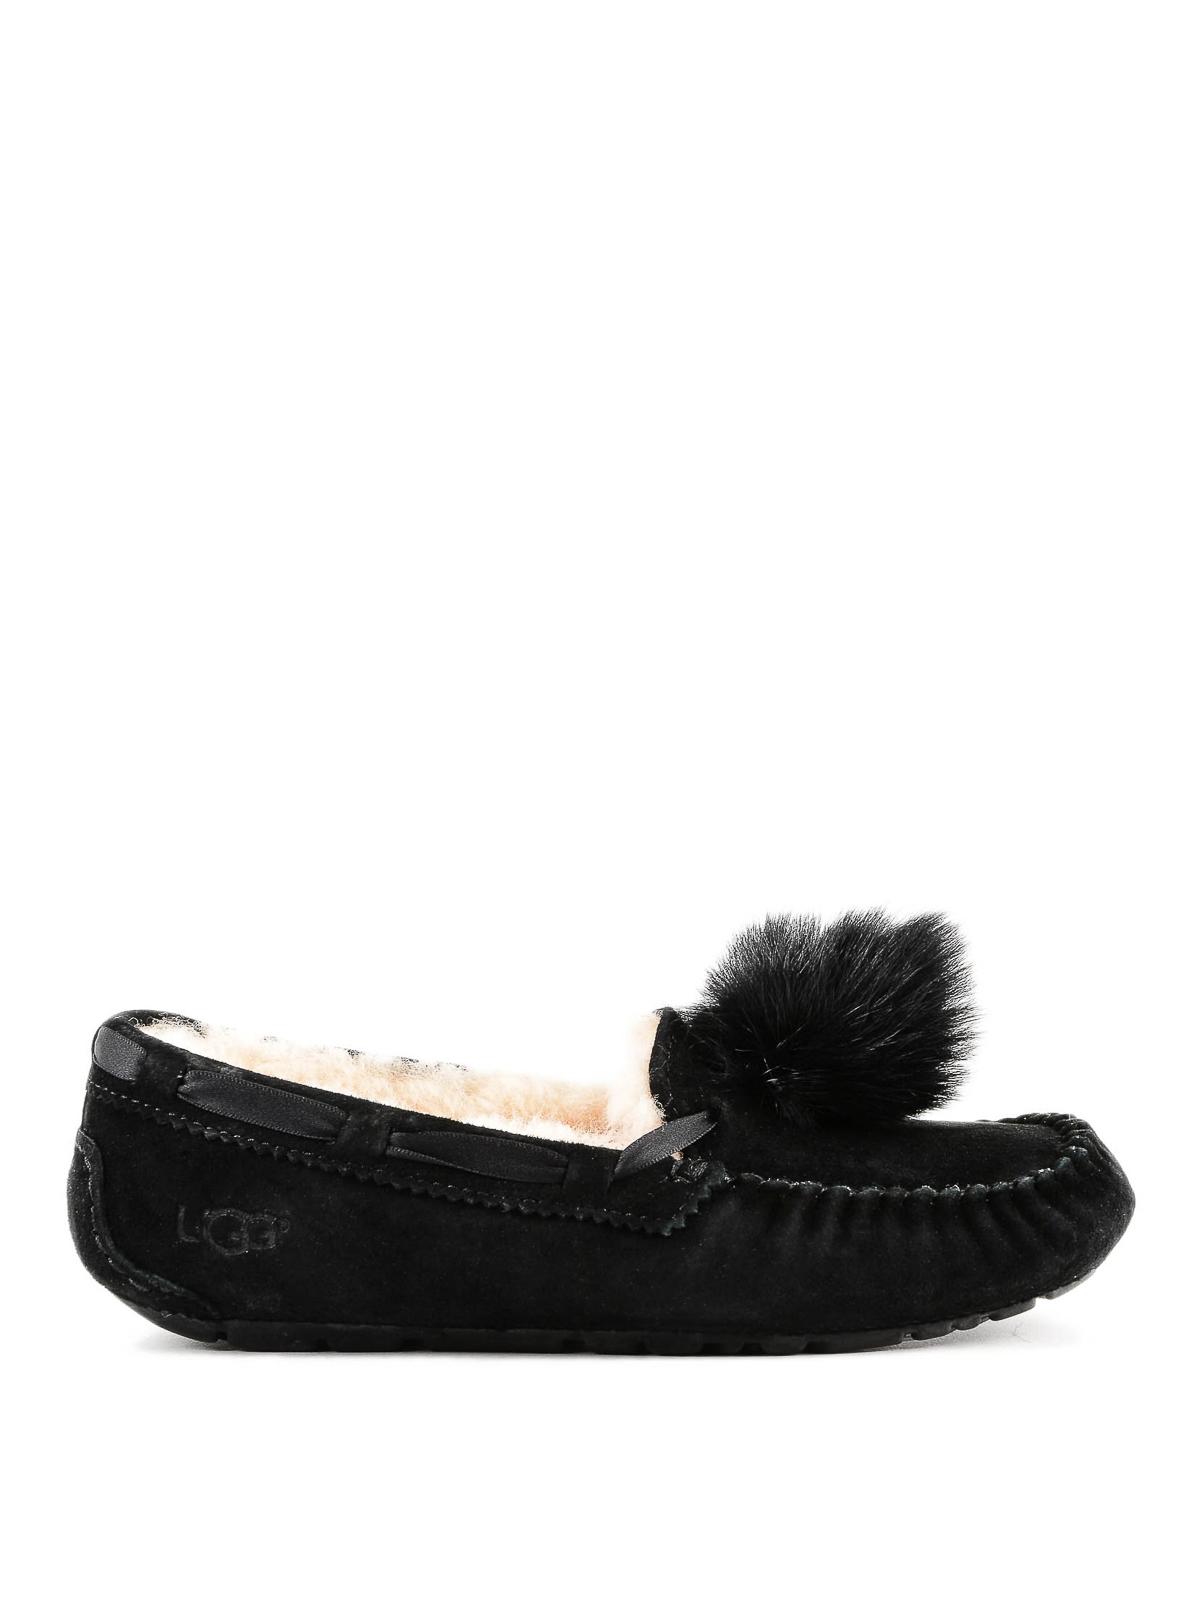 4714749eeb8 Ugg - Dakota Pom Pom black slippers - Loafers & Slippers - 1019015 BLACK